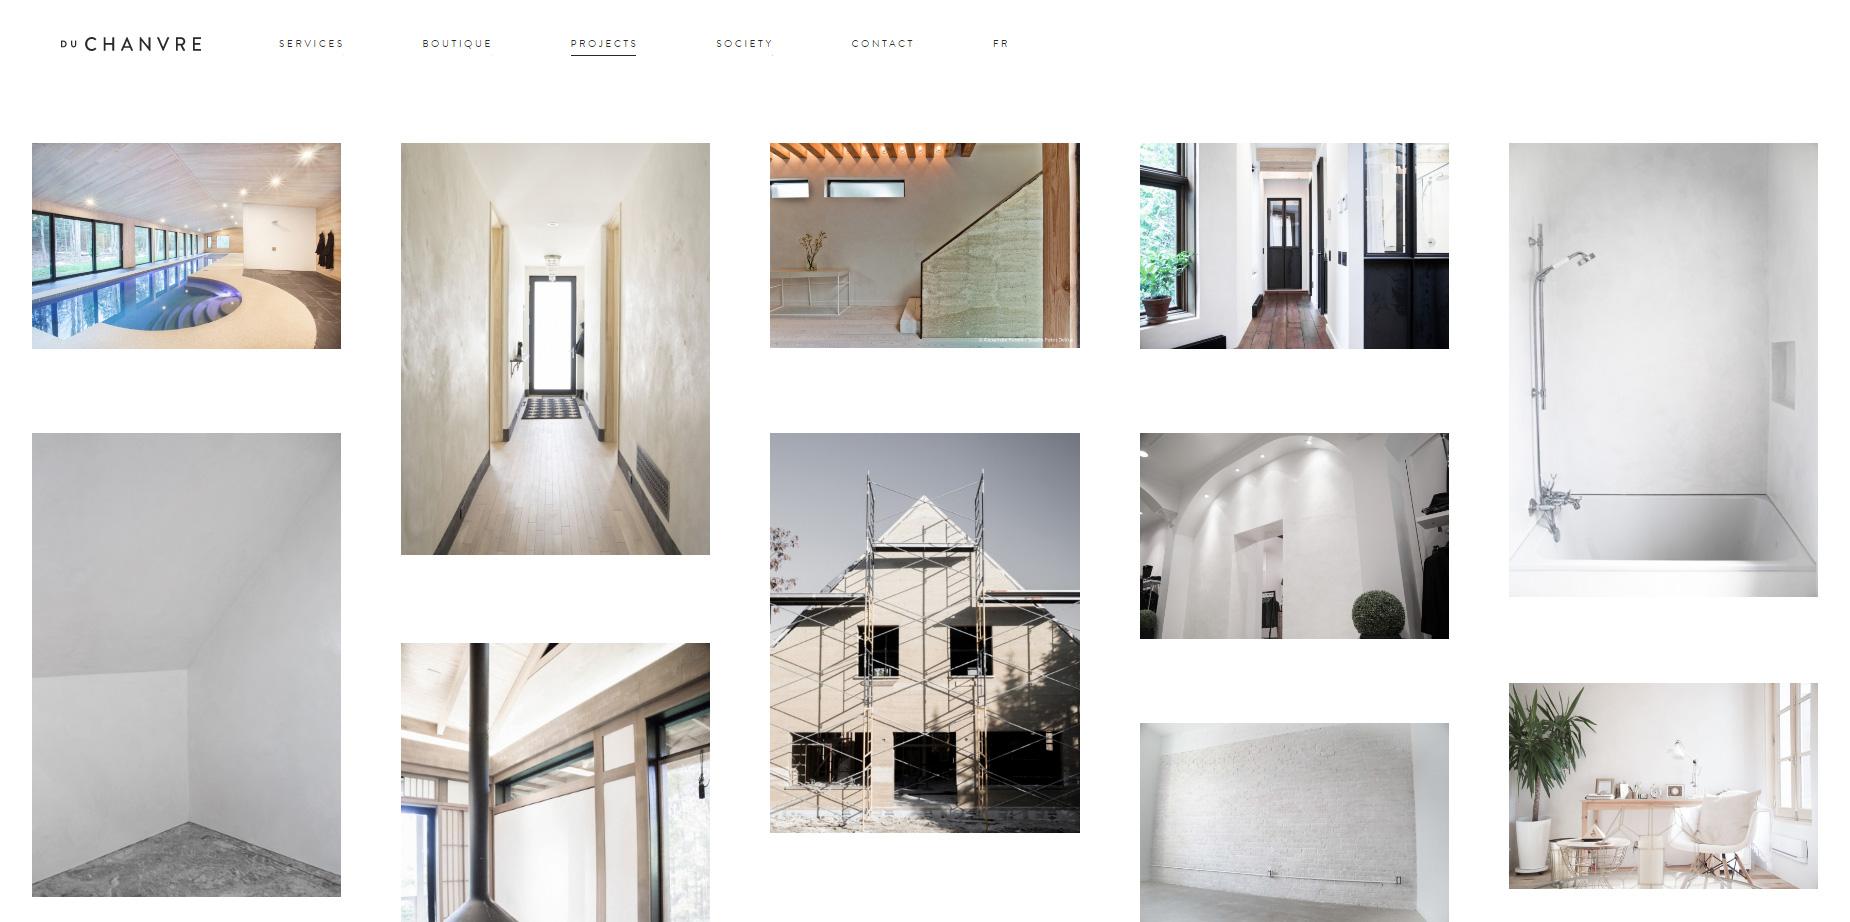 DuChanvre - Website of the Day